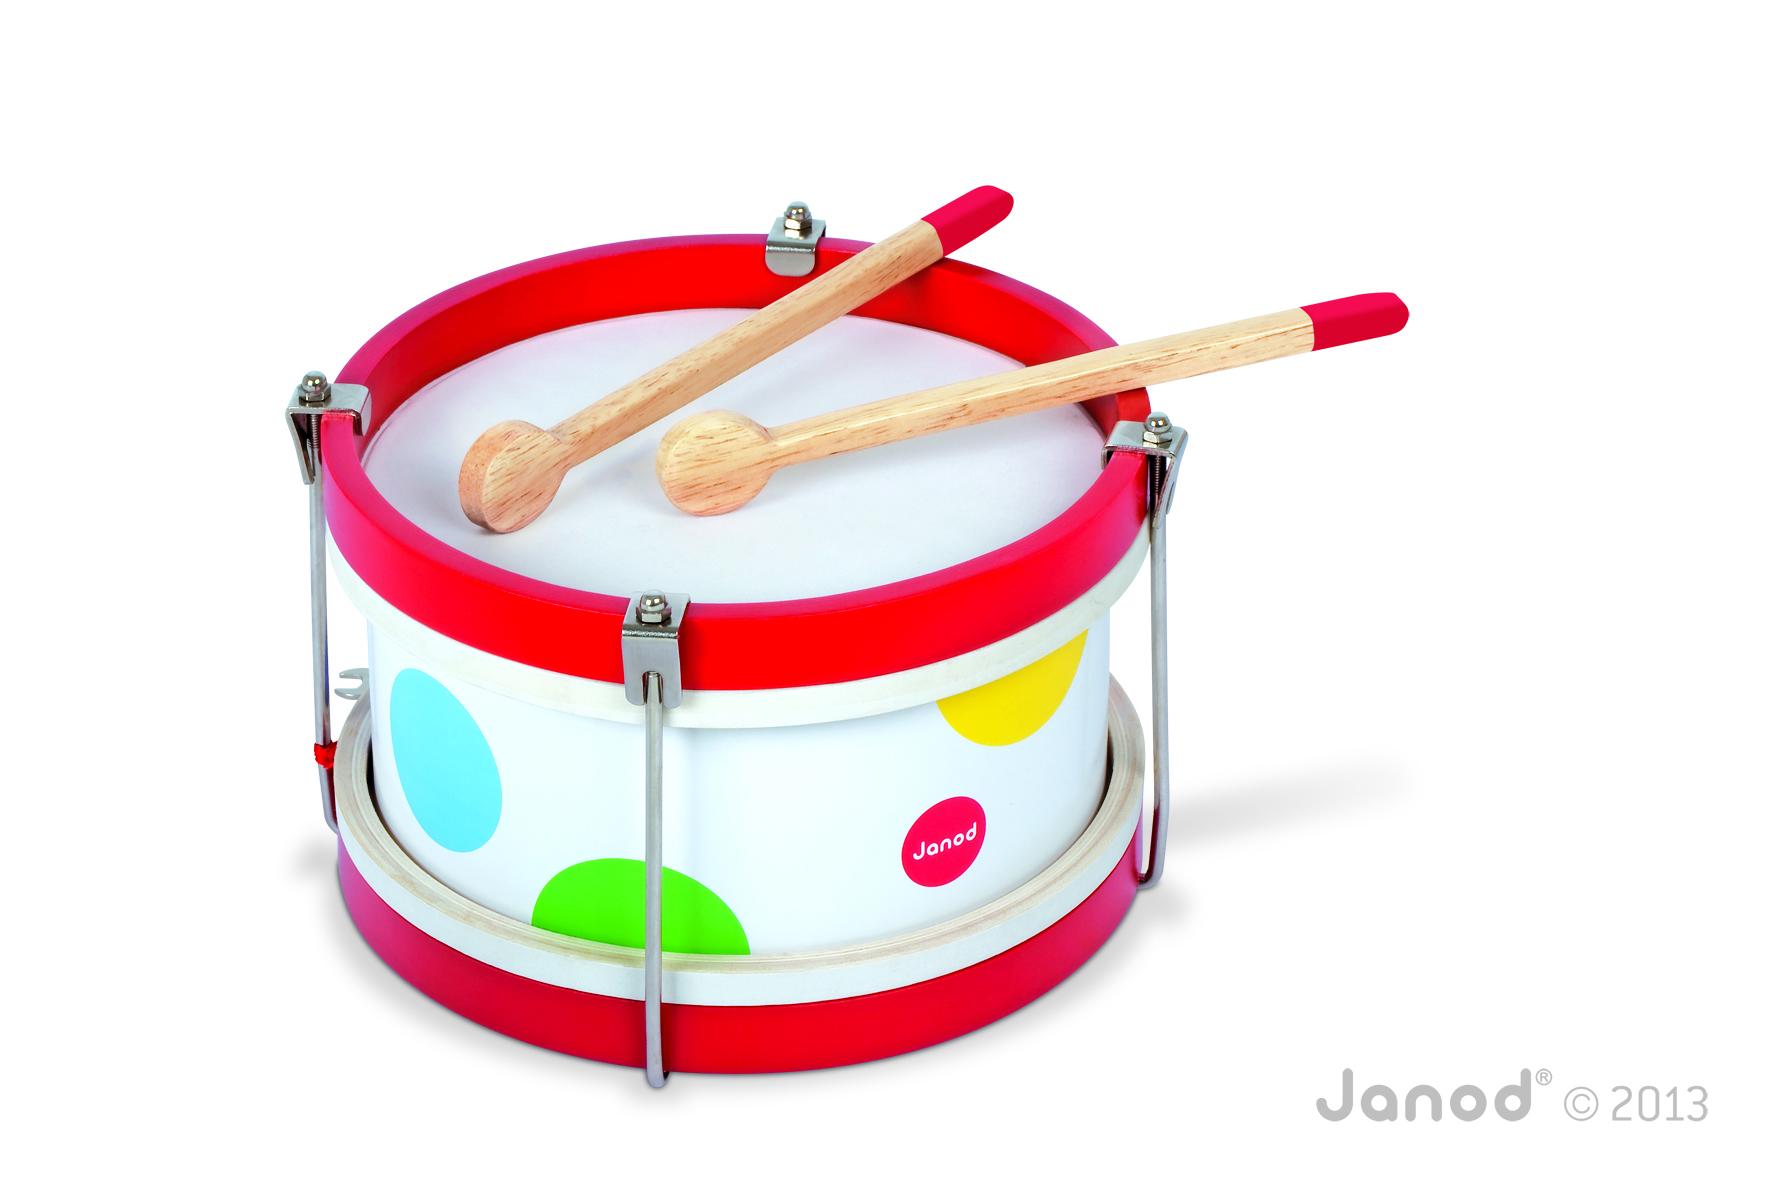 Janod Confetti My First Drum